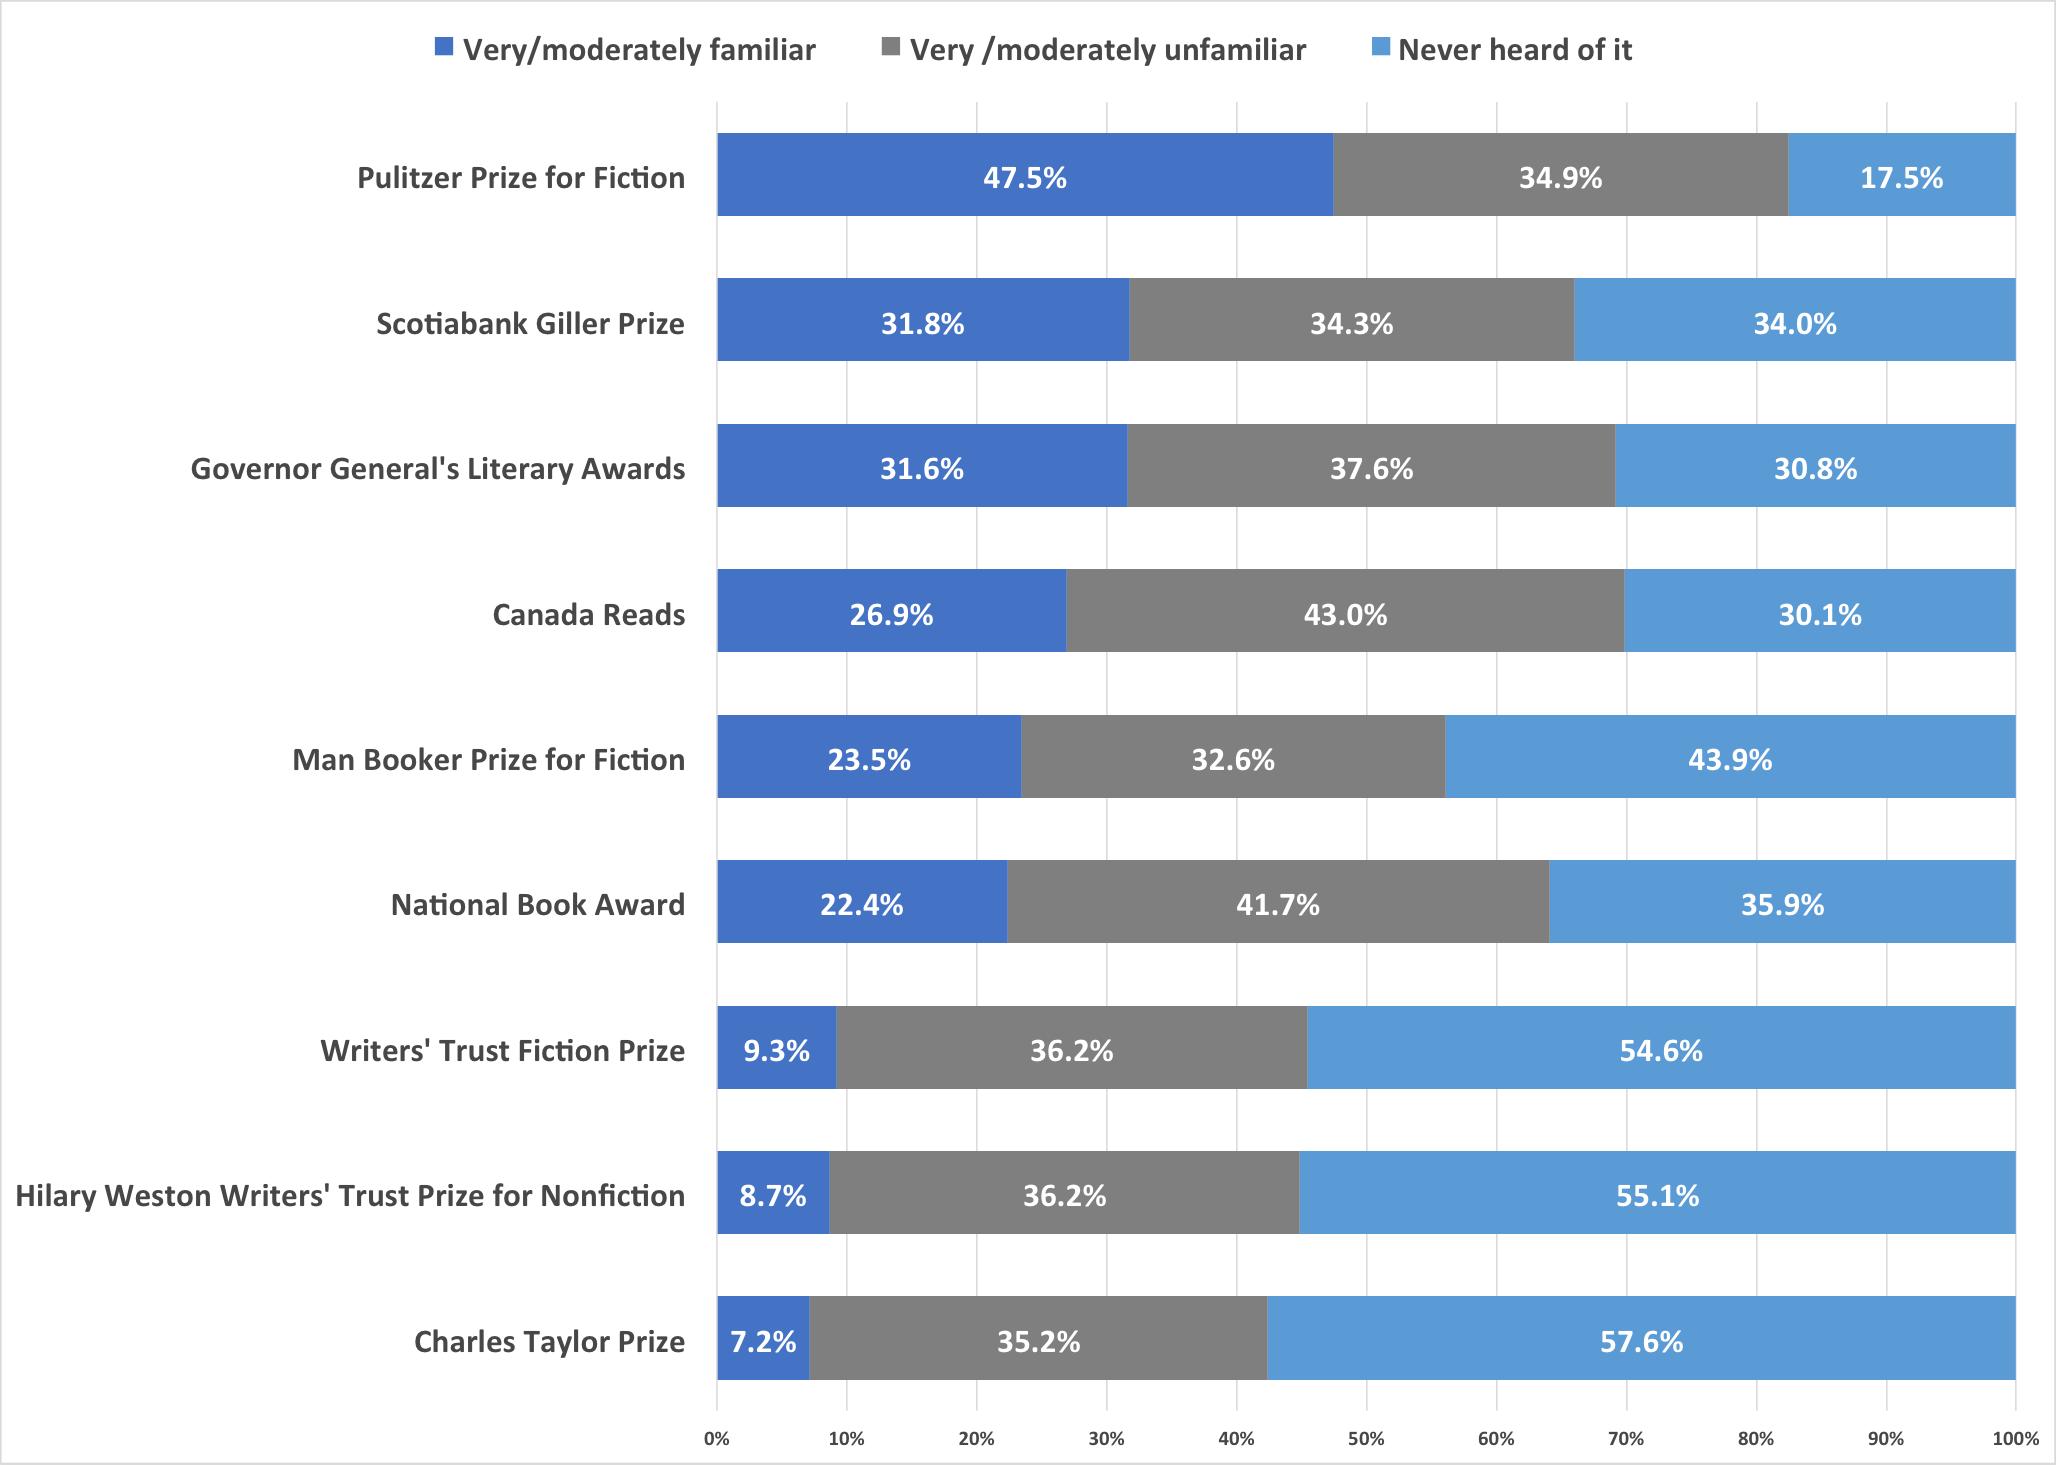 Graph measuring levels of awareness for each major literary award.